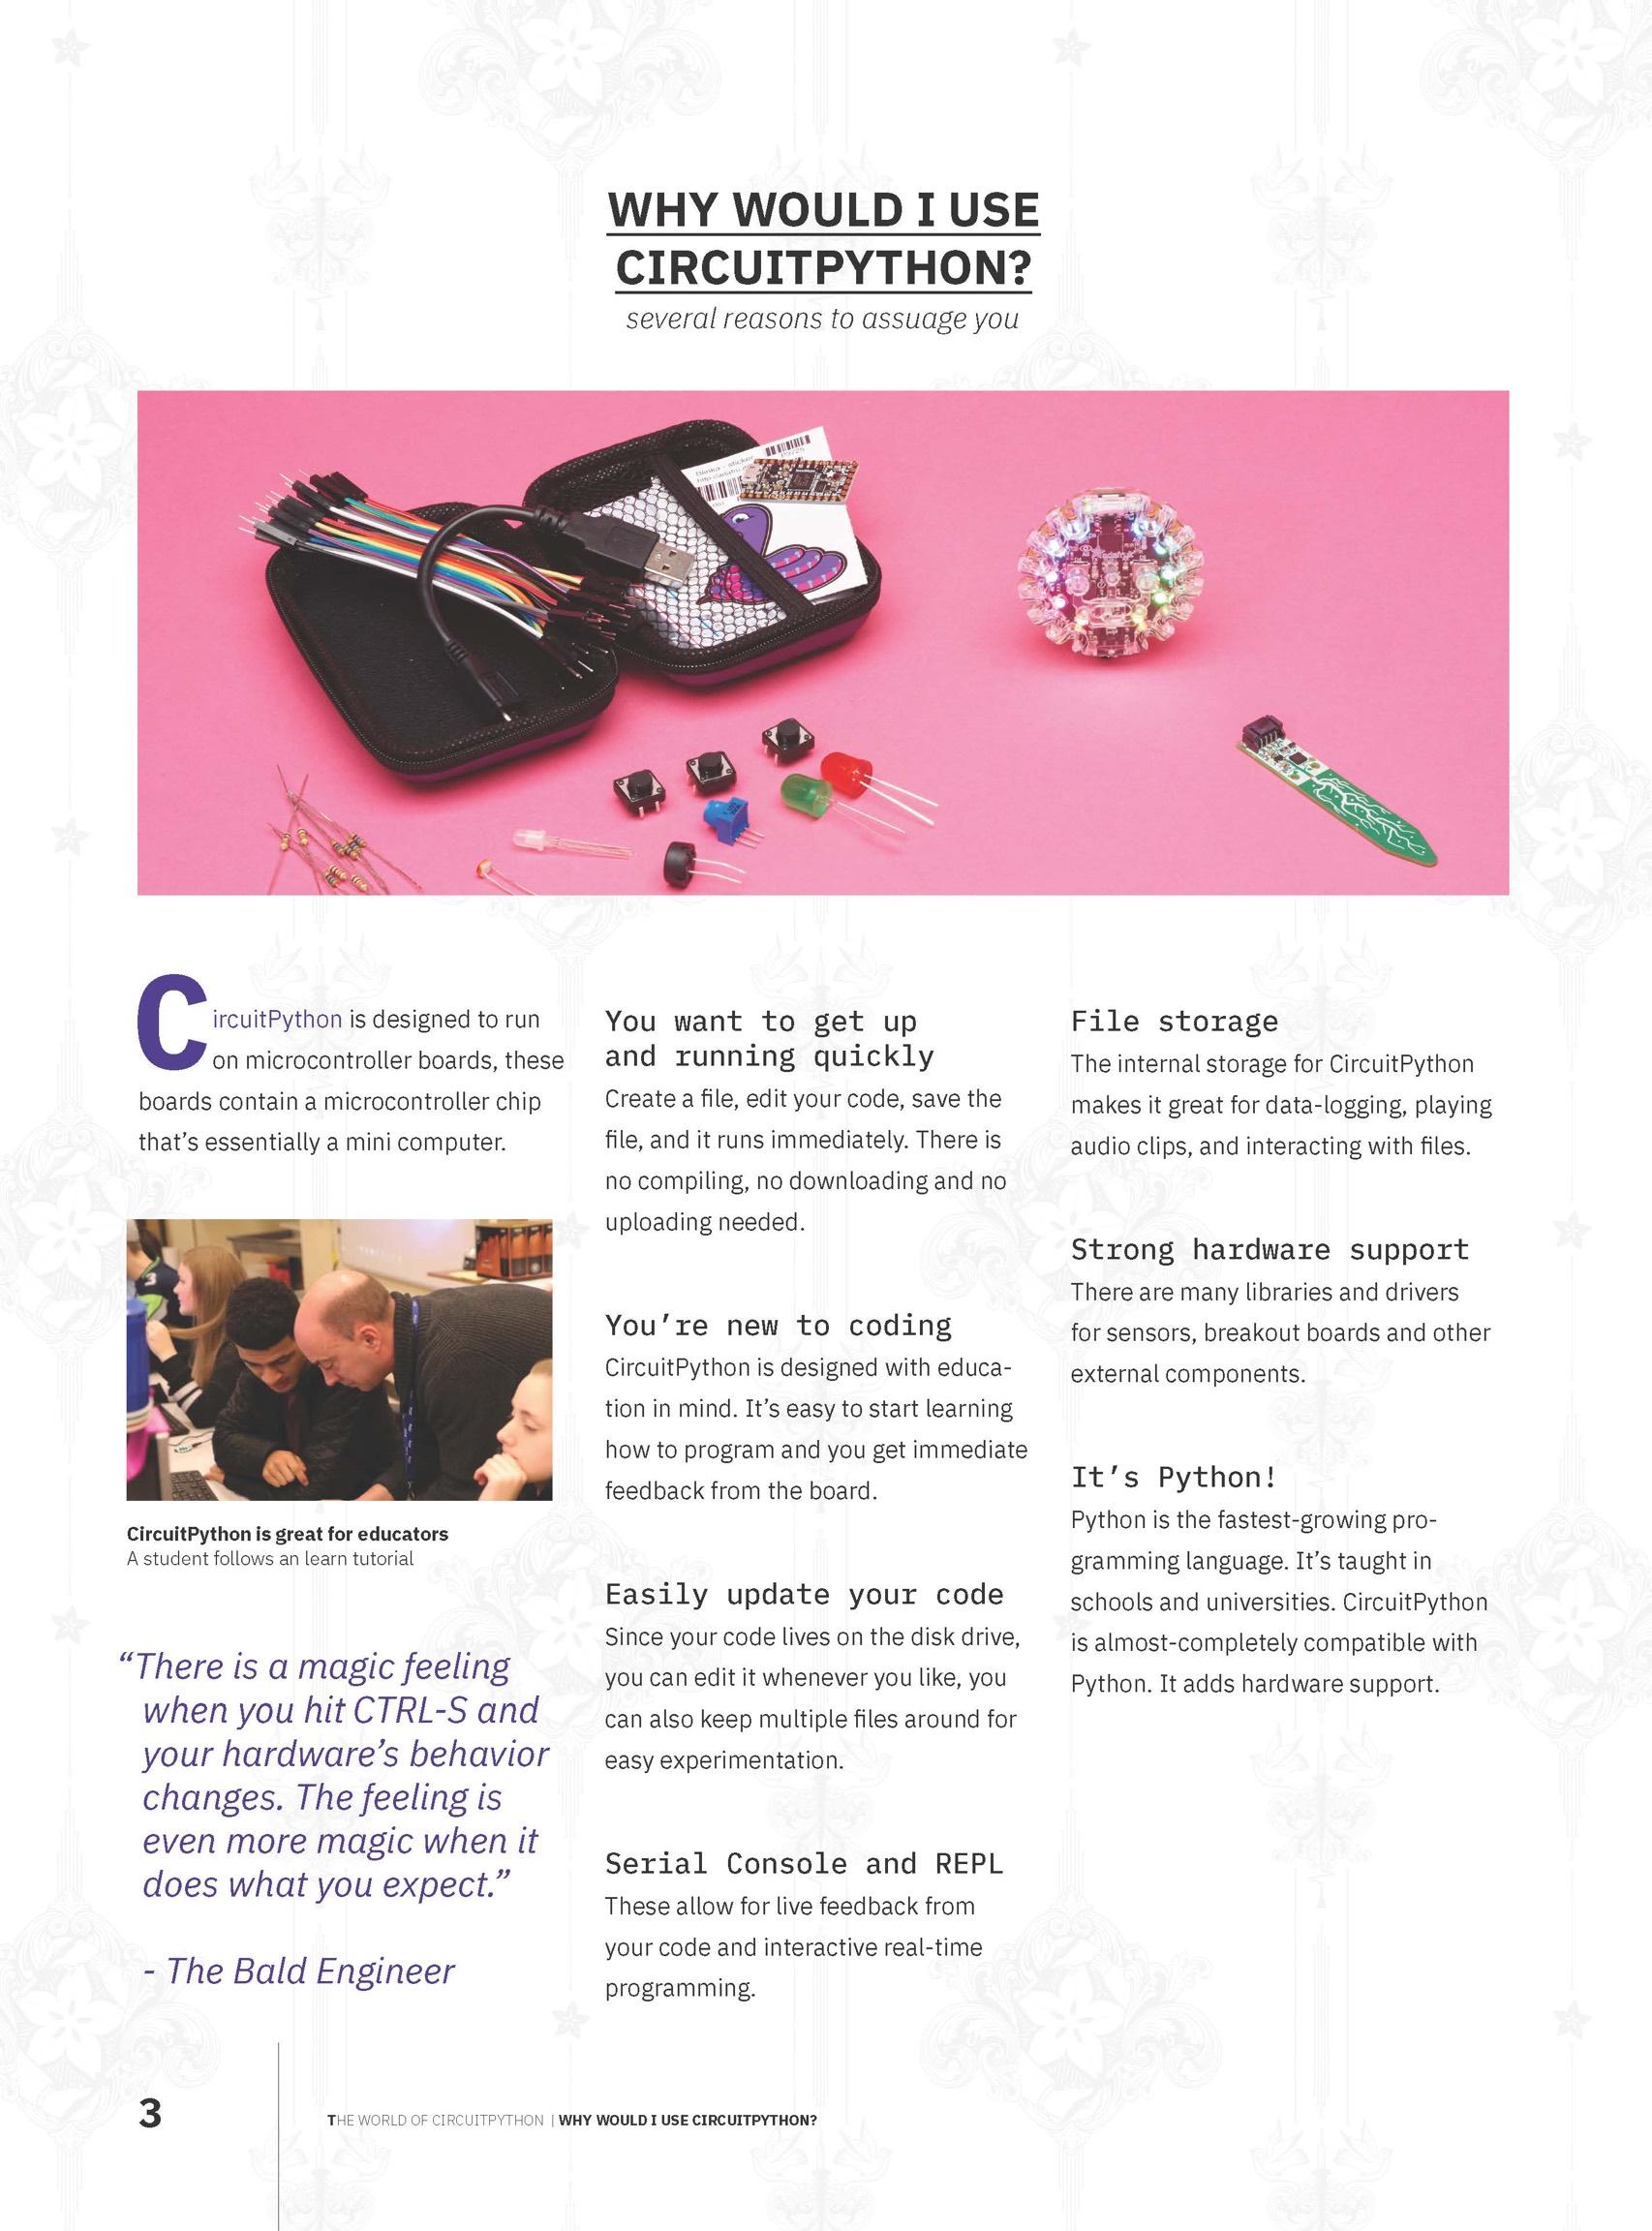 Timothy Garcia's CircuitPython magazine spread @eighthree